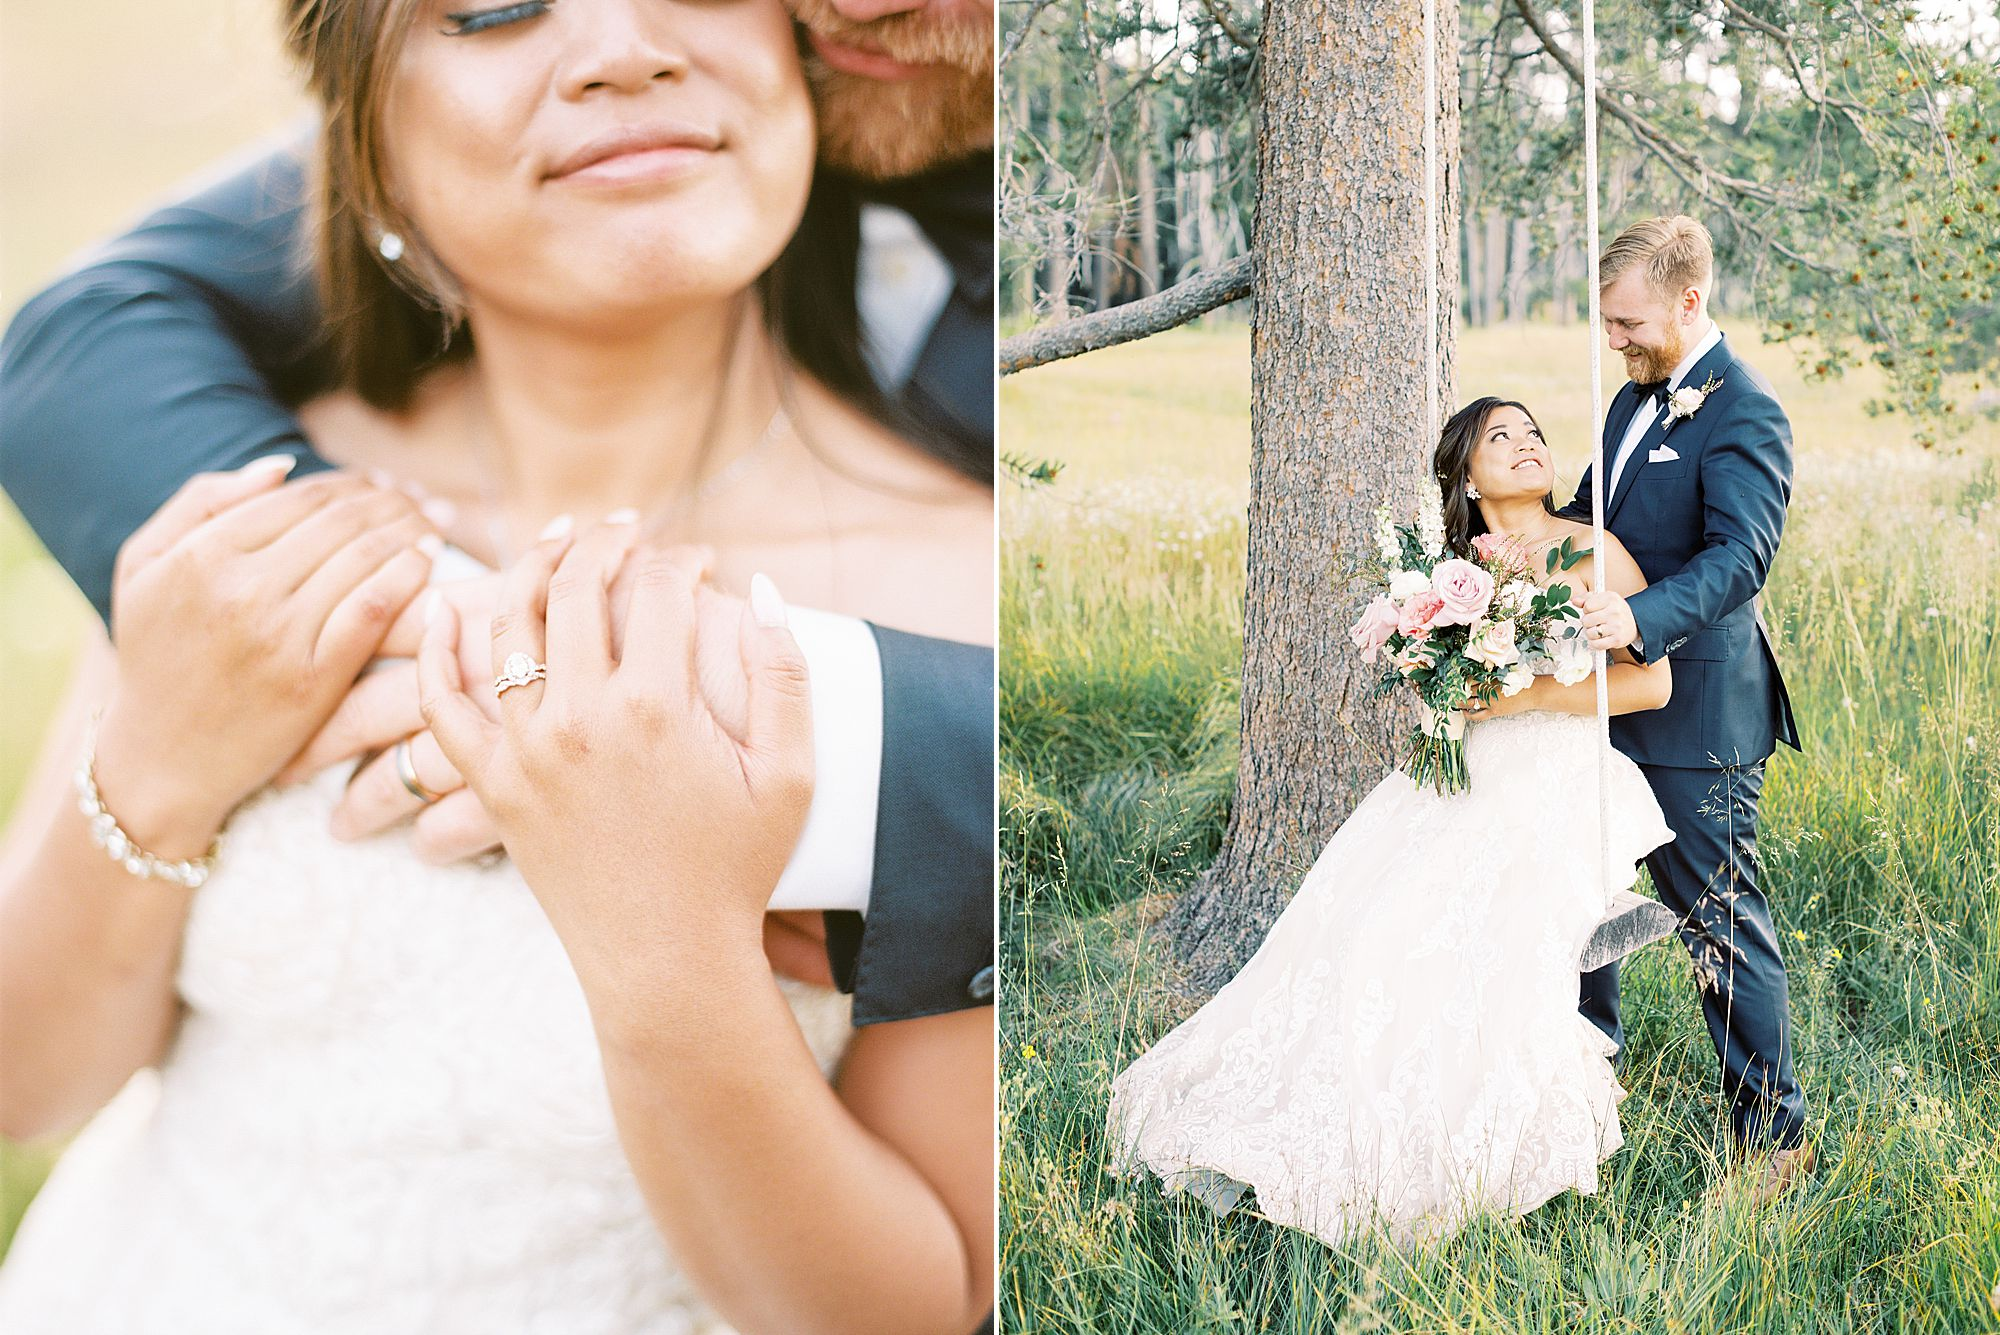 MITCHELLS MOUNTAIN MEADOWS Wedding - Ash Baumgartner - Phallina and Matt - Sierraville Wedding - Tahoe Wedding Photography_0030.jpg